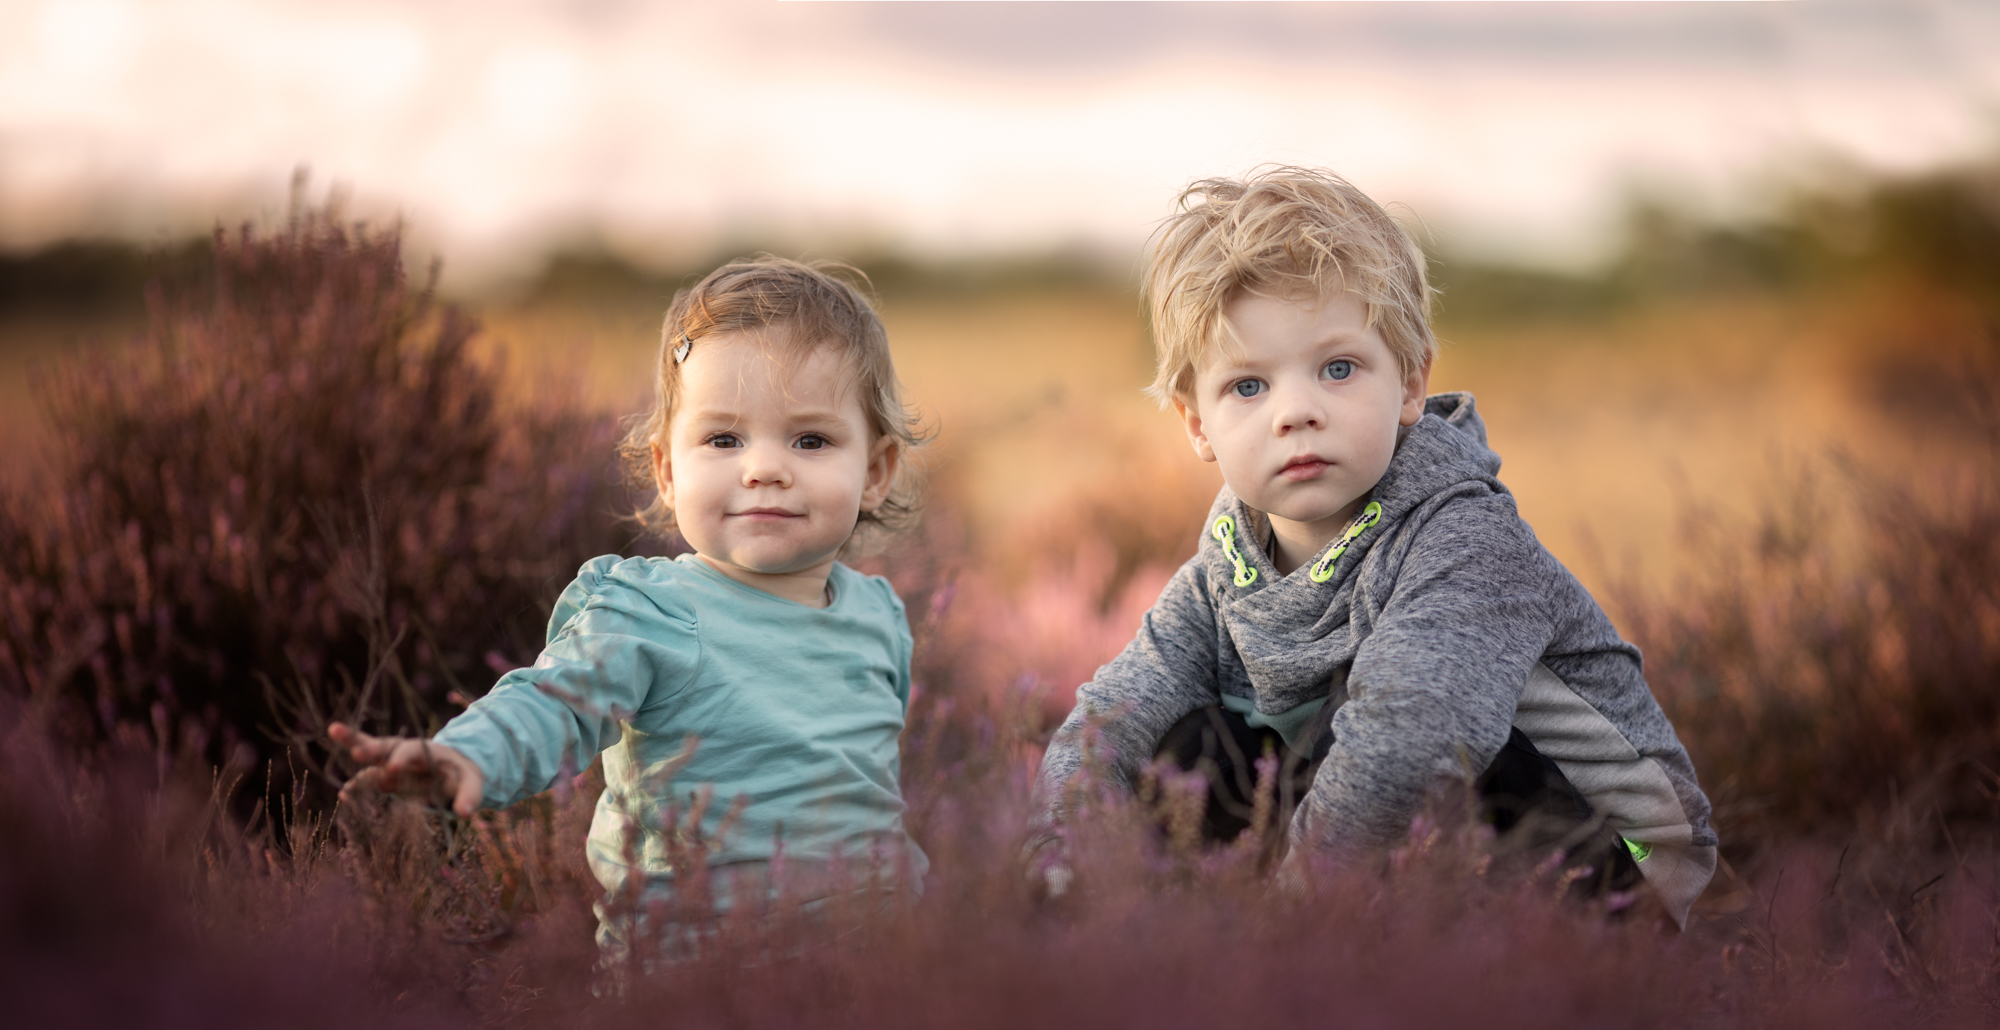 Familiefotograaf en kinderfotograaf Flevoland Lelystad